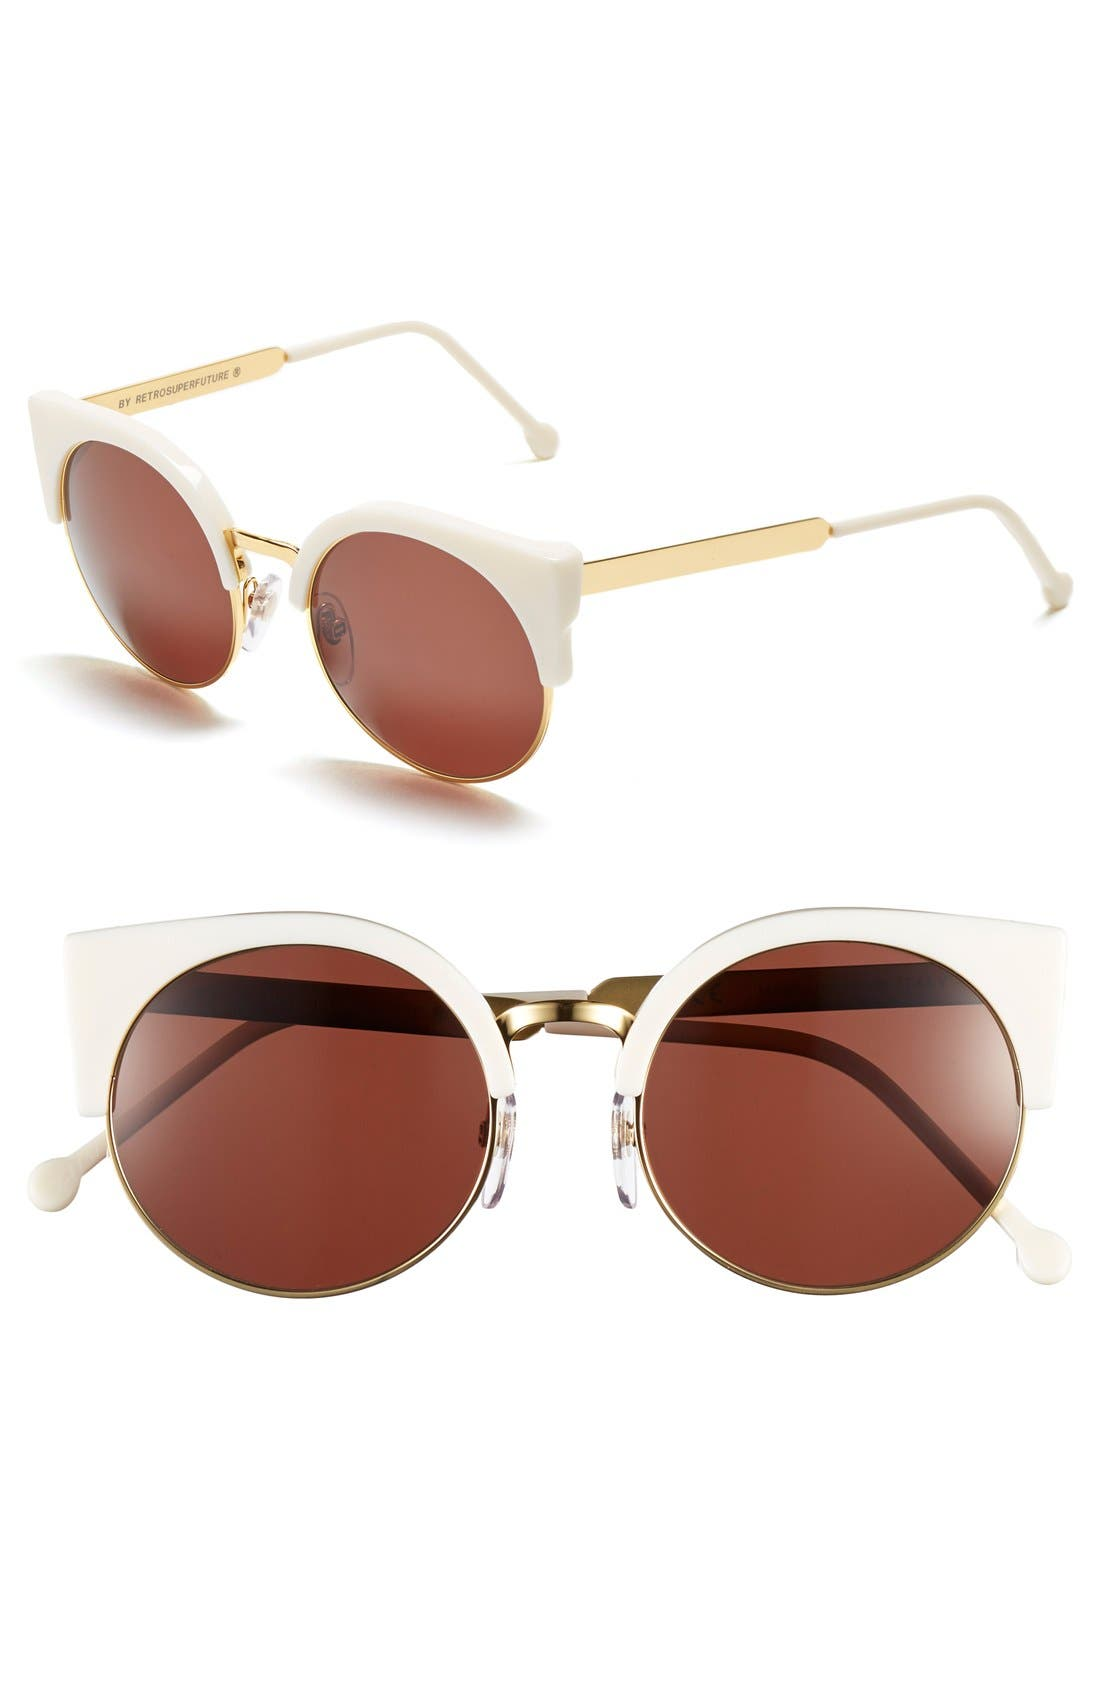 Main Image - SUPER by RETROSUPERFUTURE® 'Lucia' 53mm Sunglasses